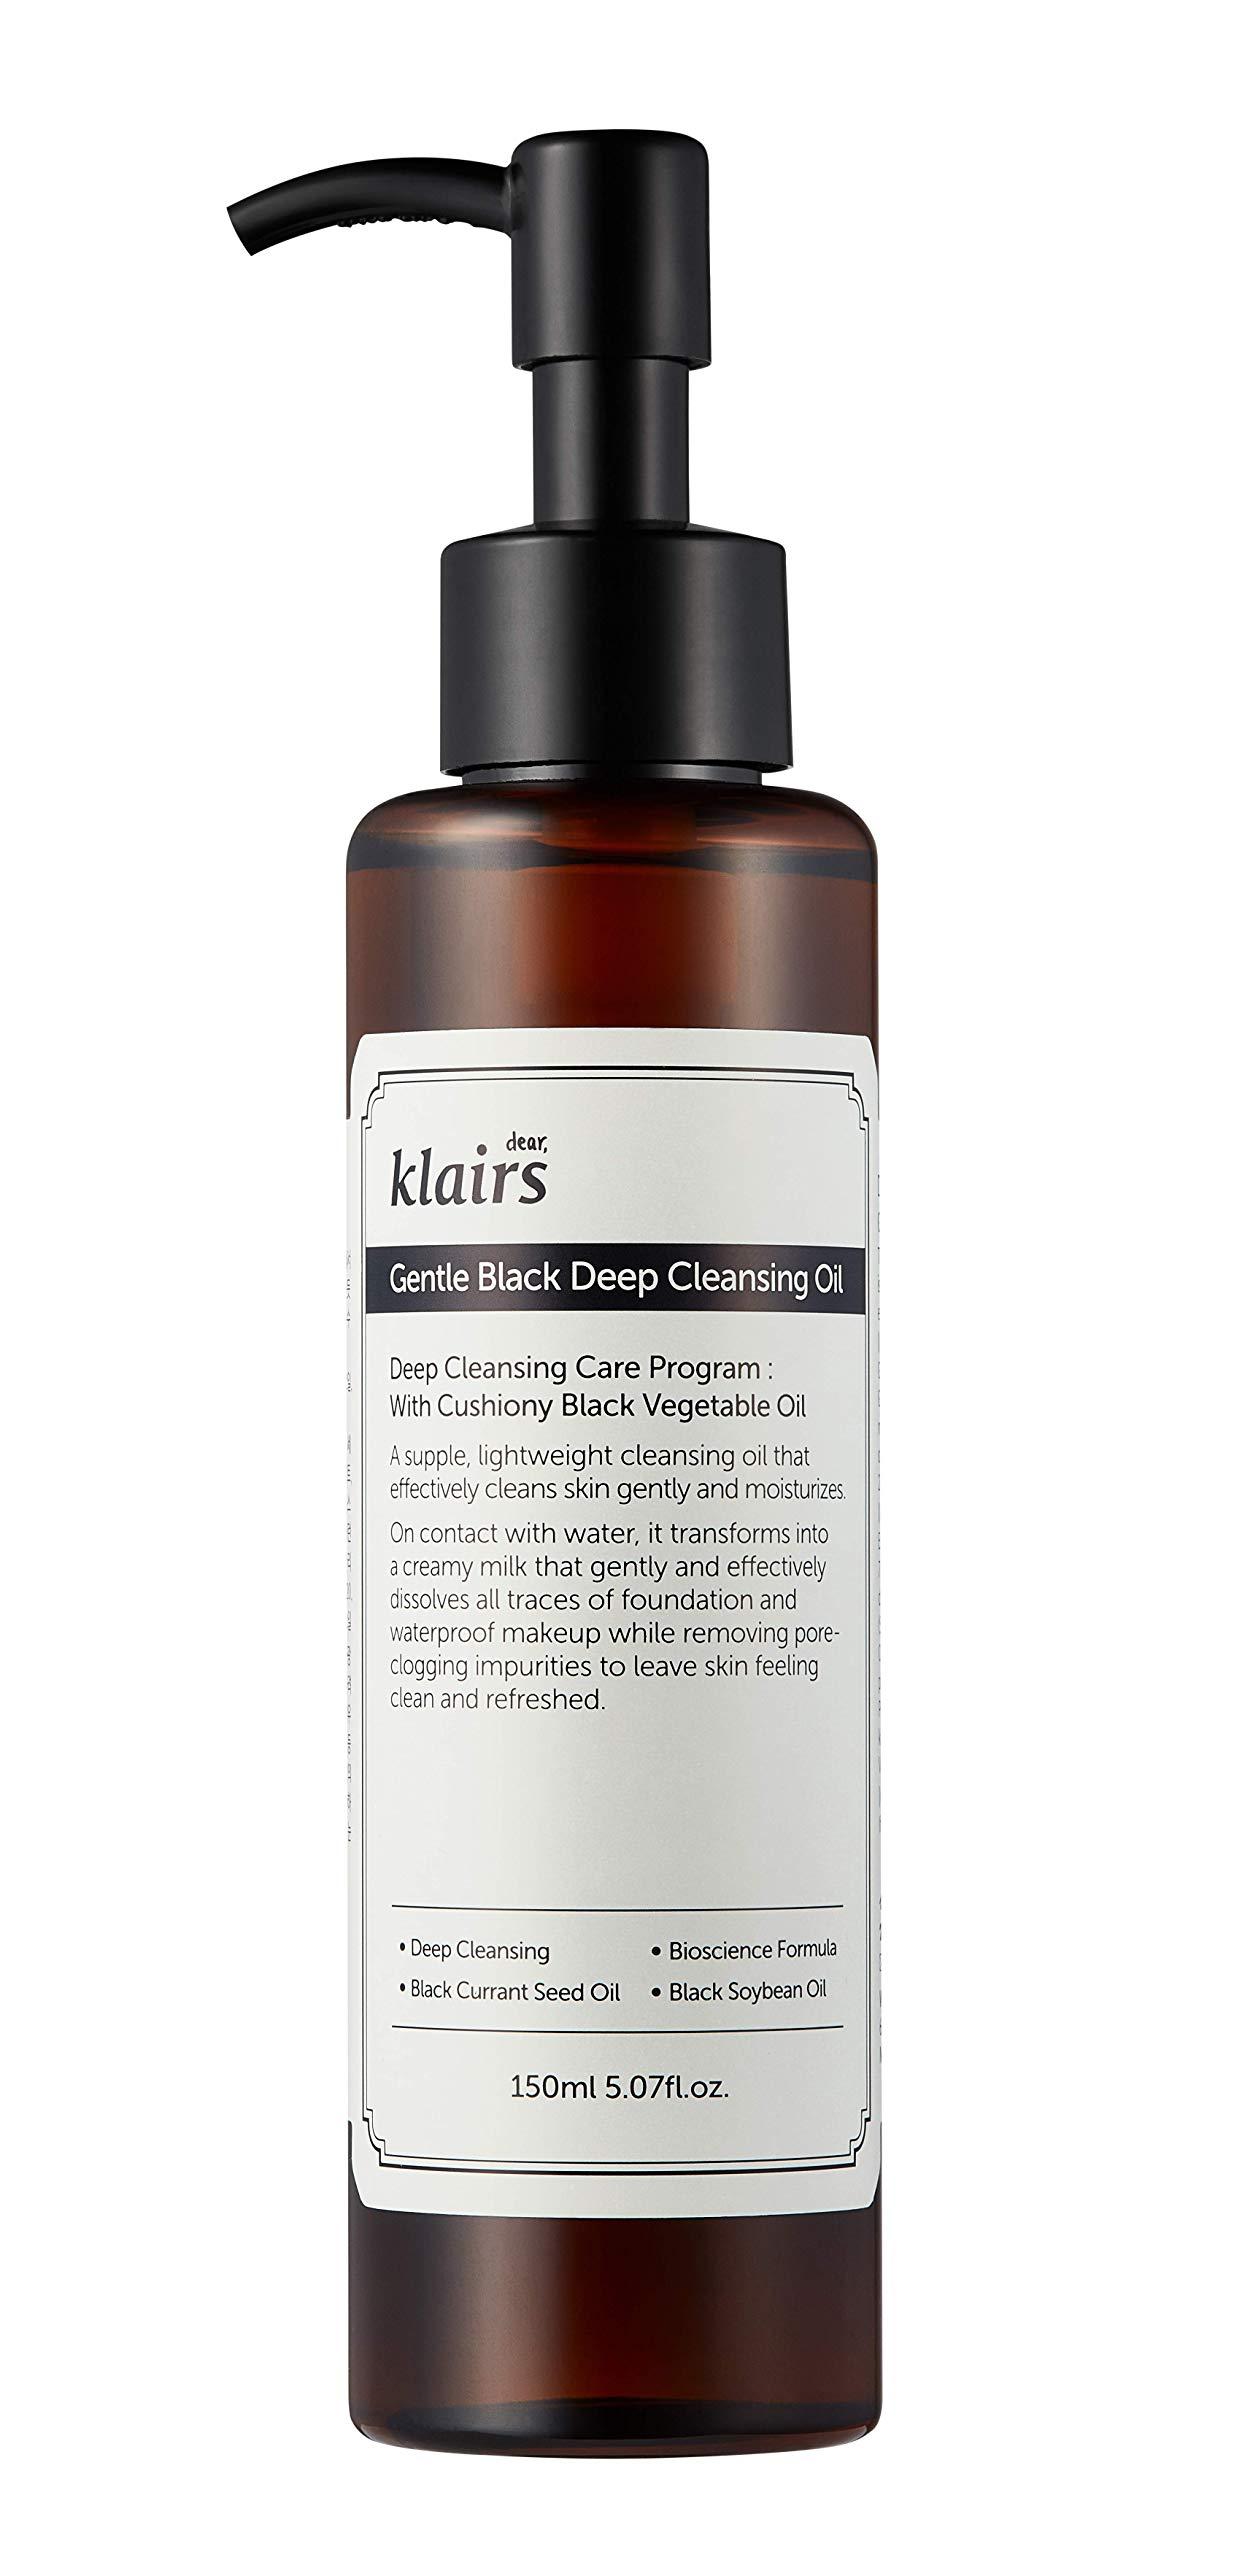 [KLAIRS] Gentle Black Deep Cleansing Oil,make up cleansing oil, cleanser, 150ml, 5.07oz